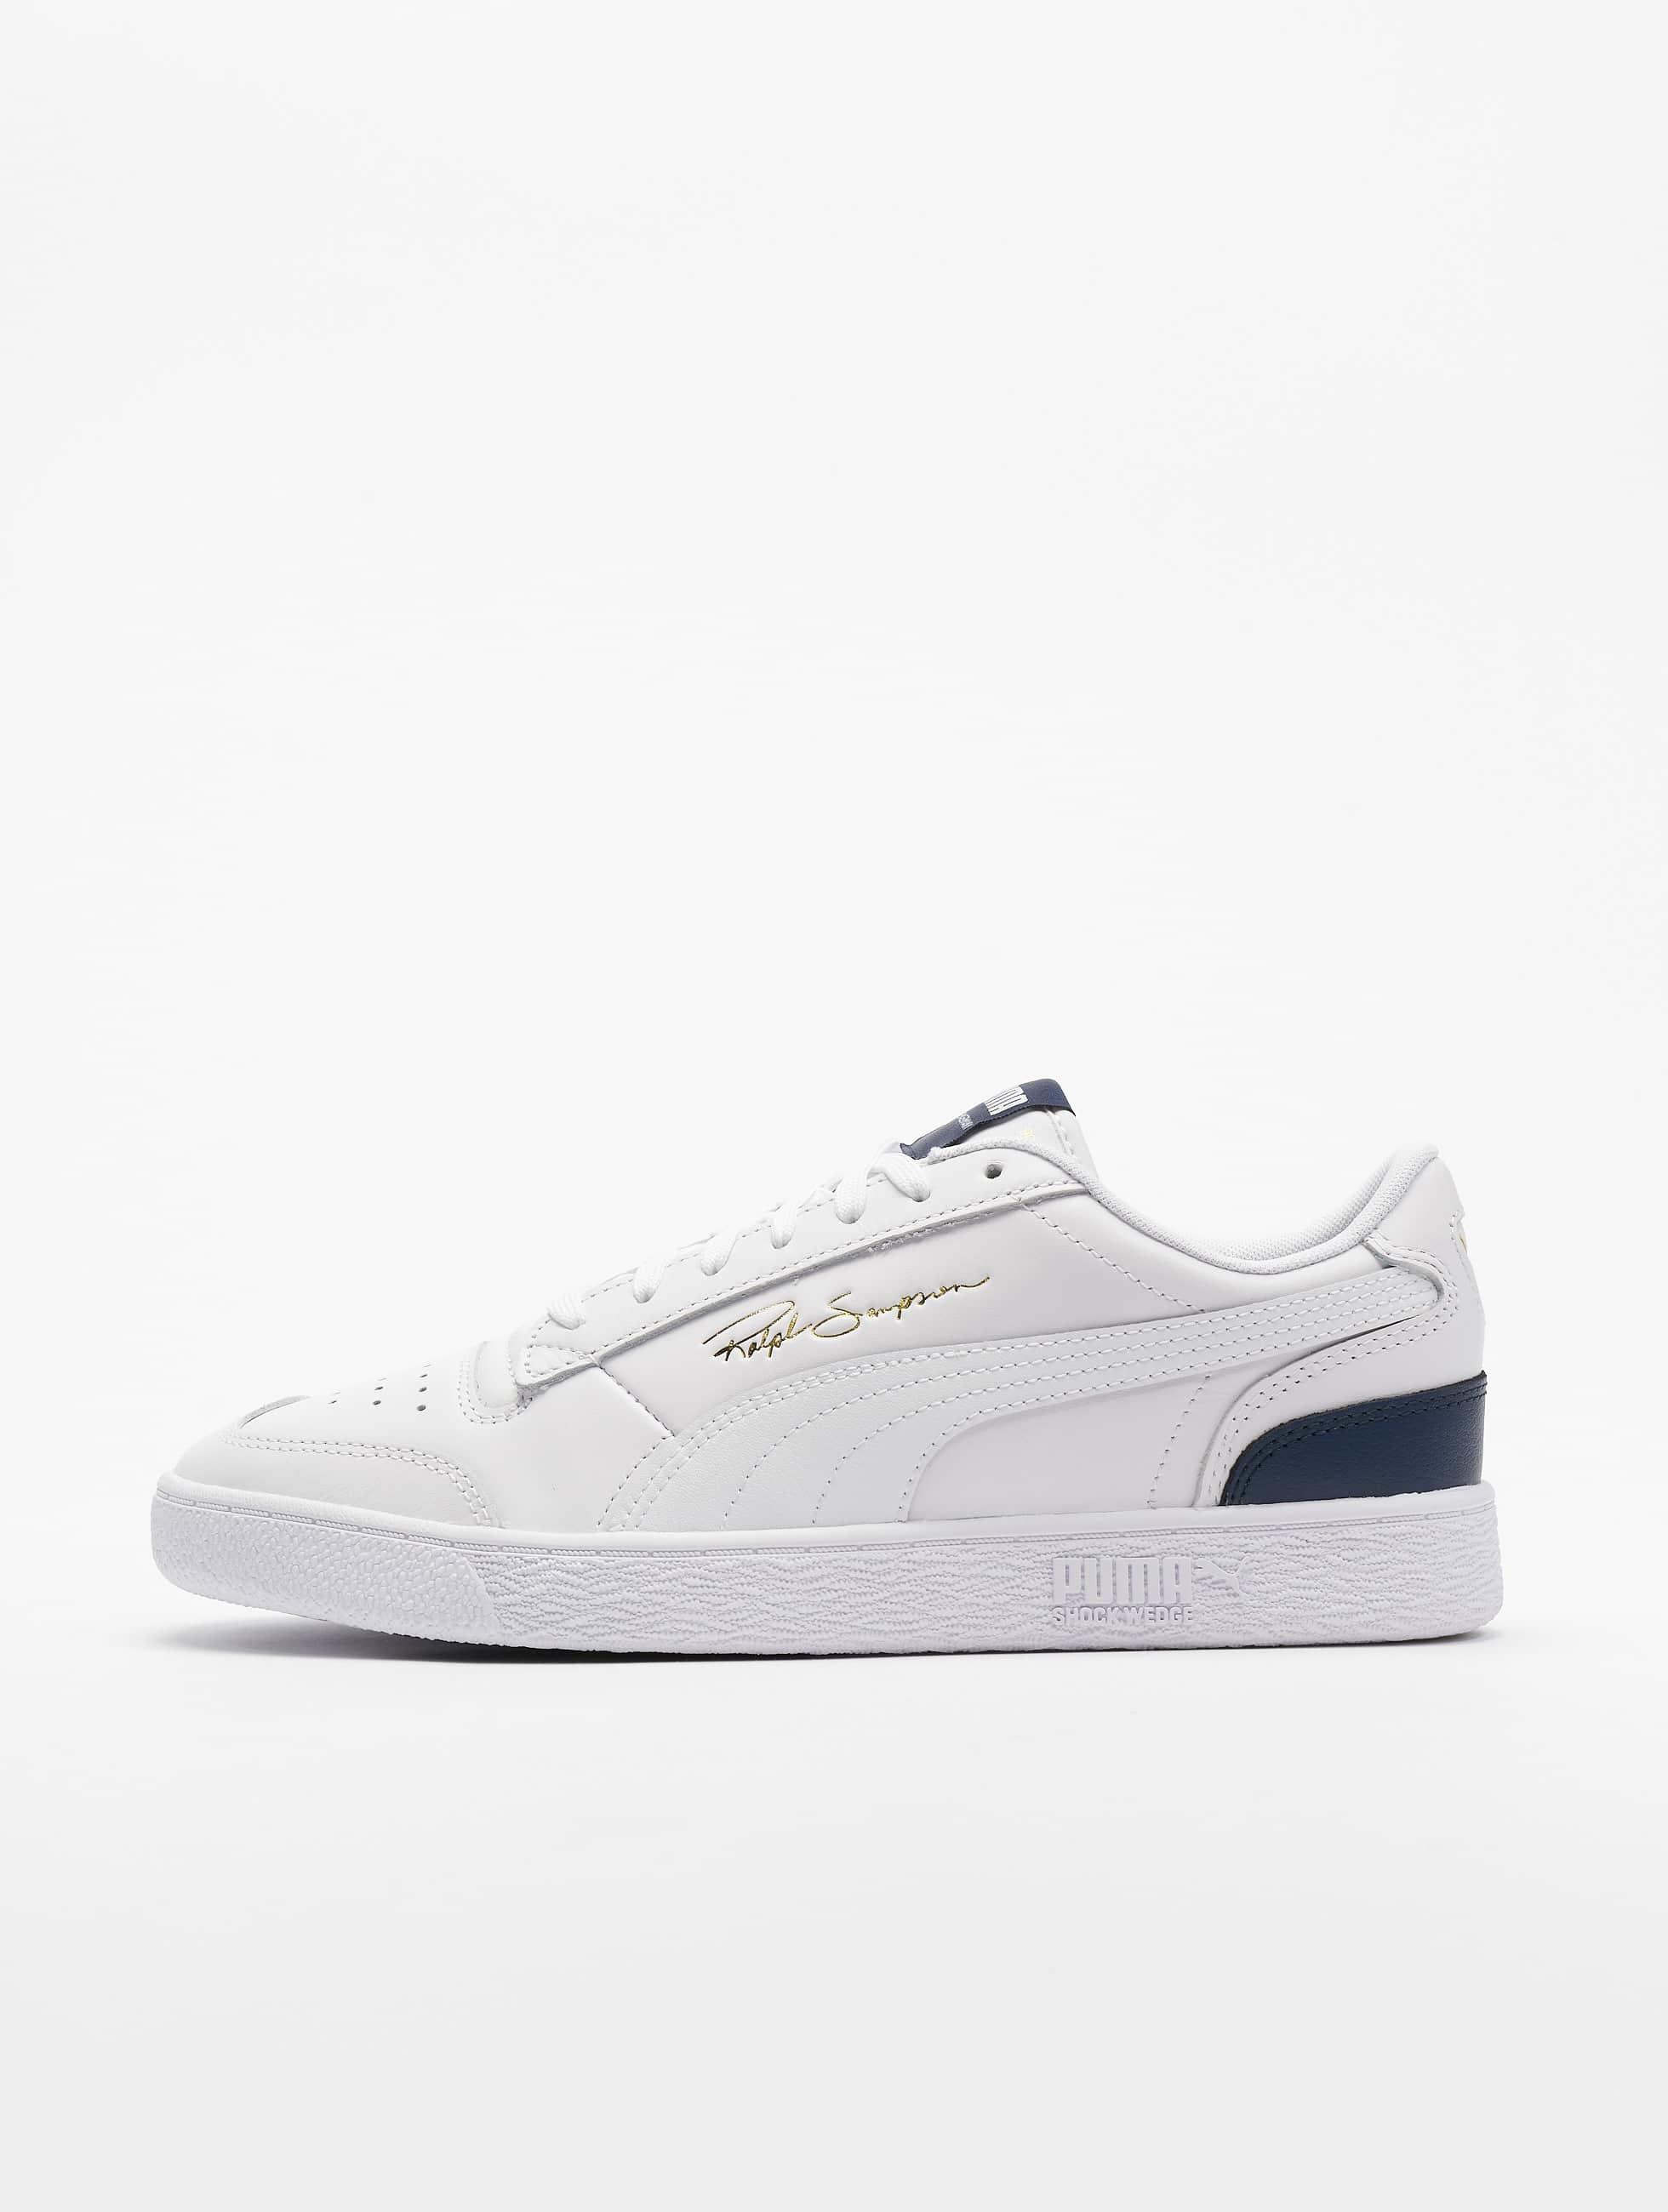 Puma Shoes | Sneakers | Poshmark